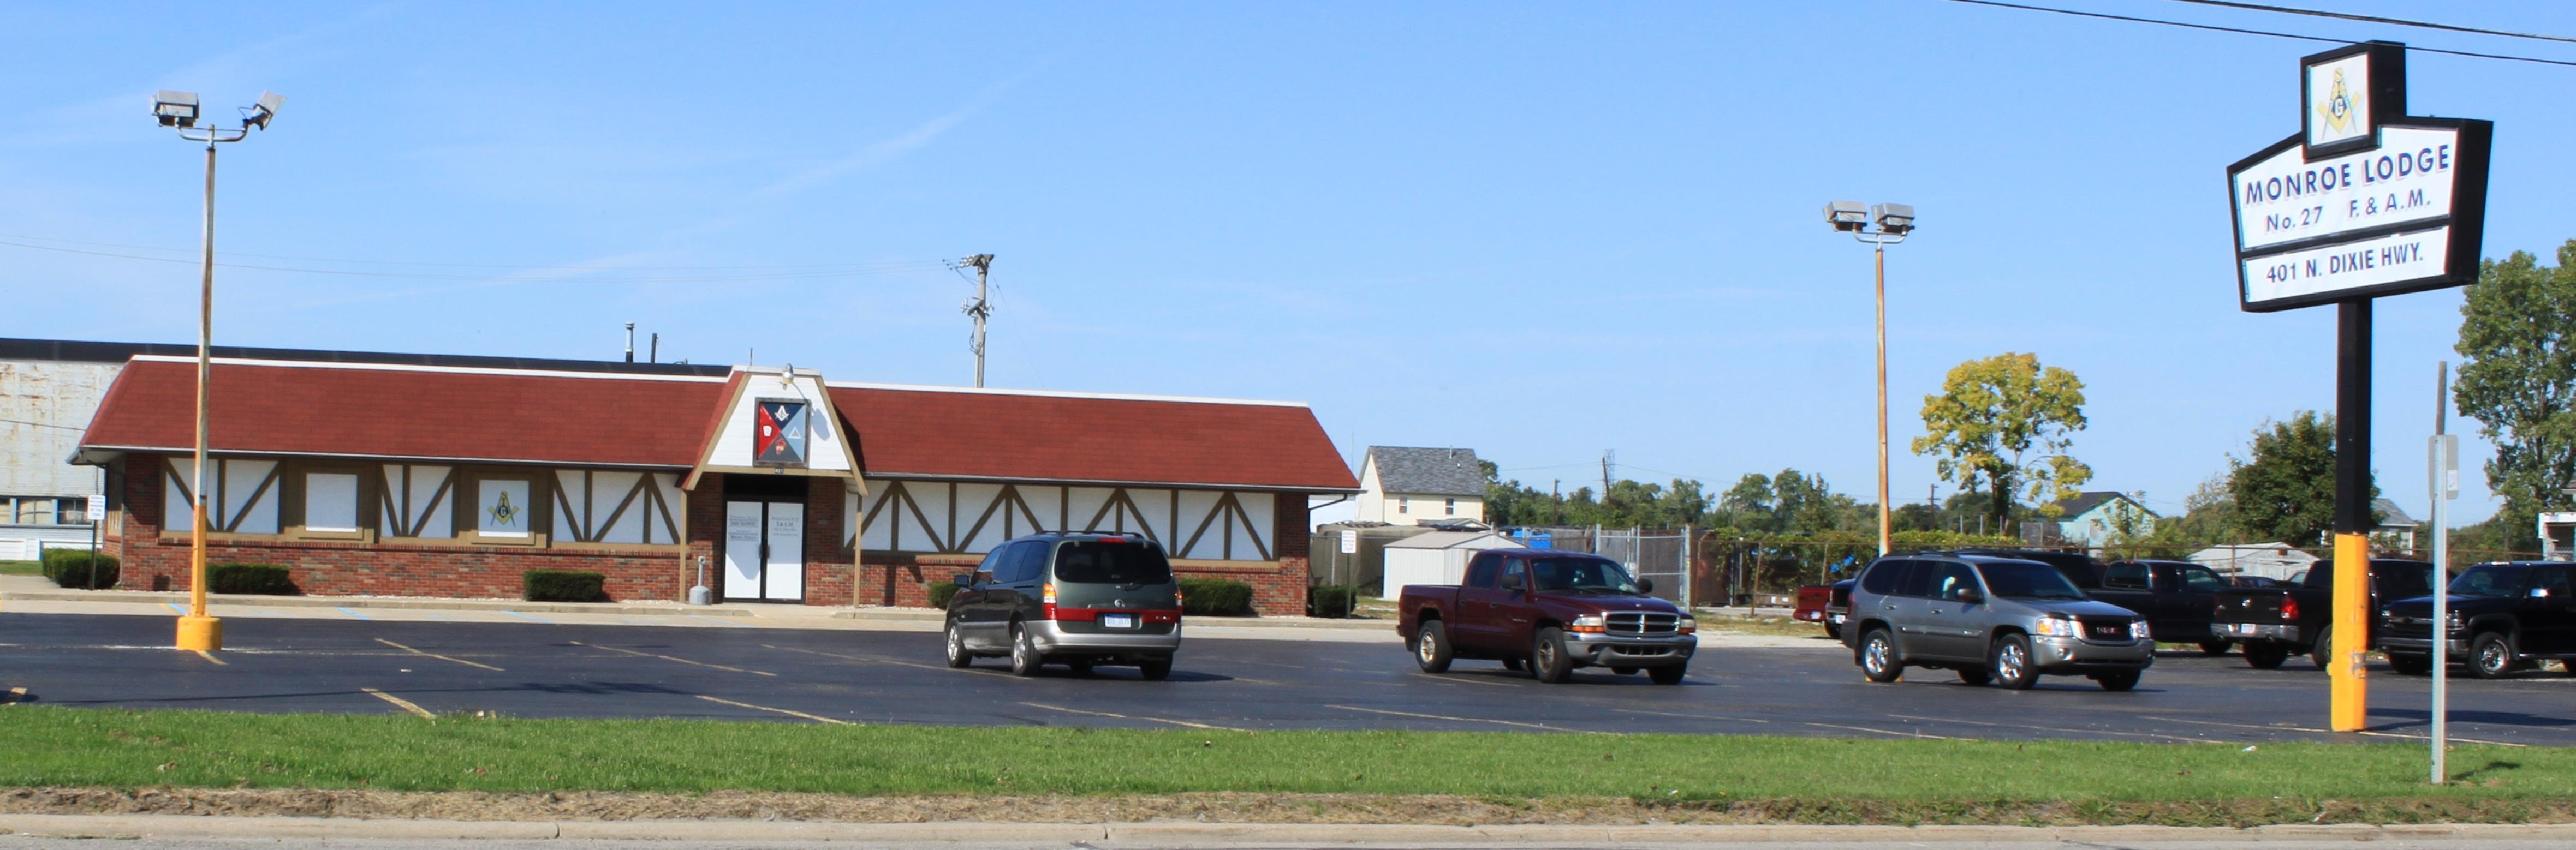 File:Masonic Lodge No. 27, 401 North Dixie Highway, Monroe ...